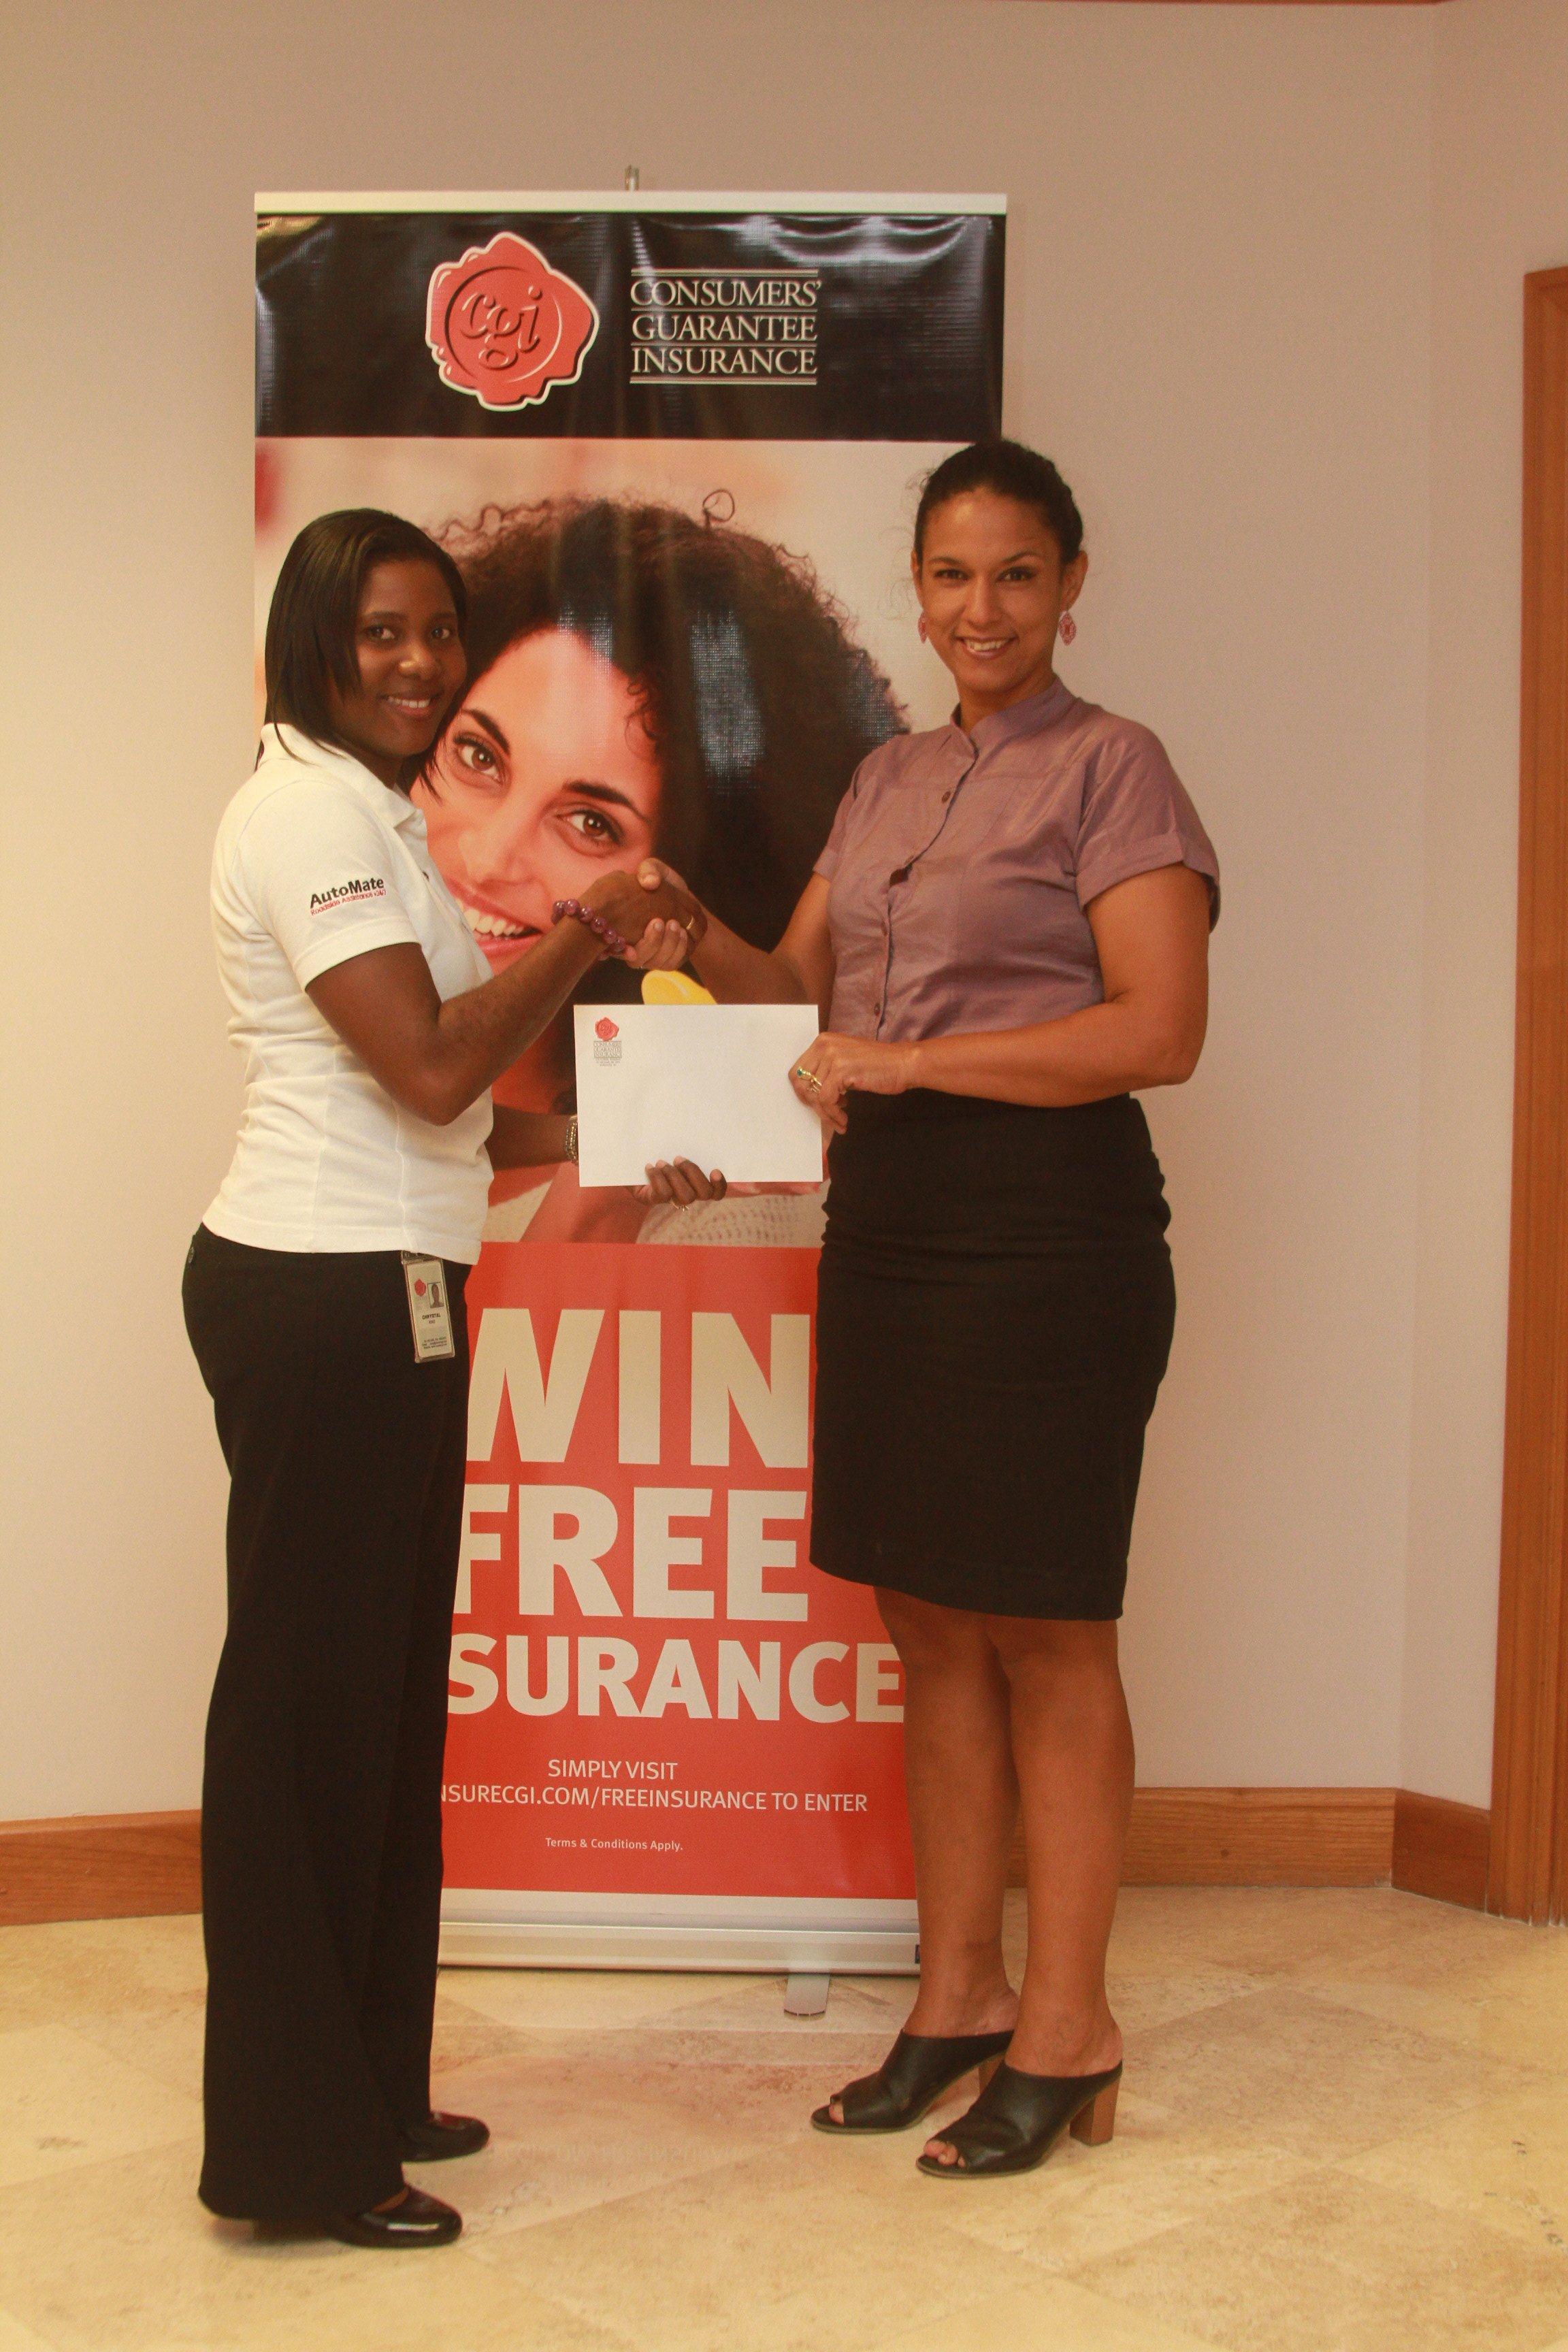 PR_-_Win_Free_Insurance_Promotion_-_1st_Winner_-_Presentation_Photo